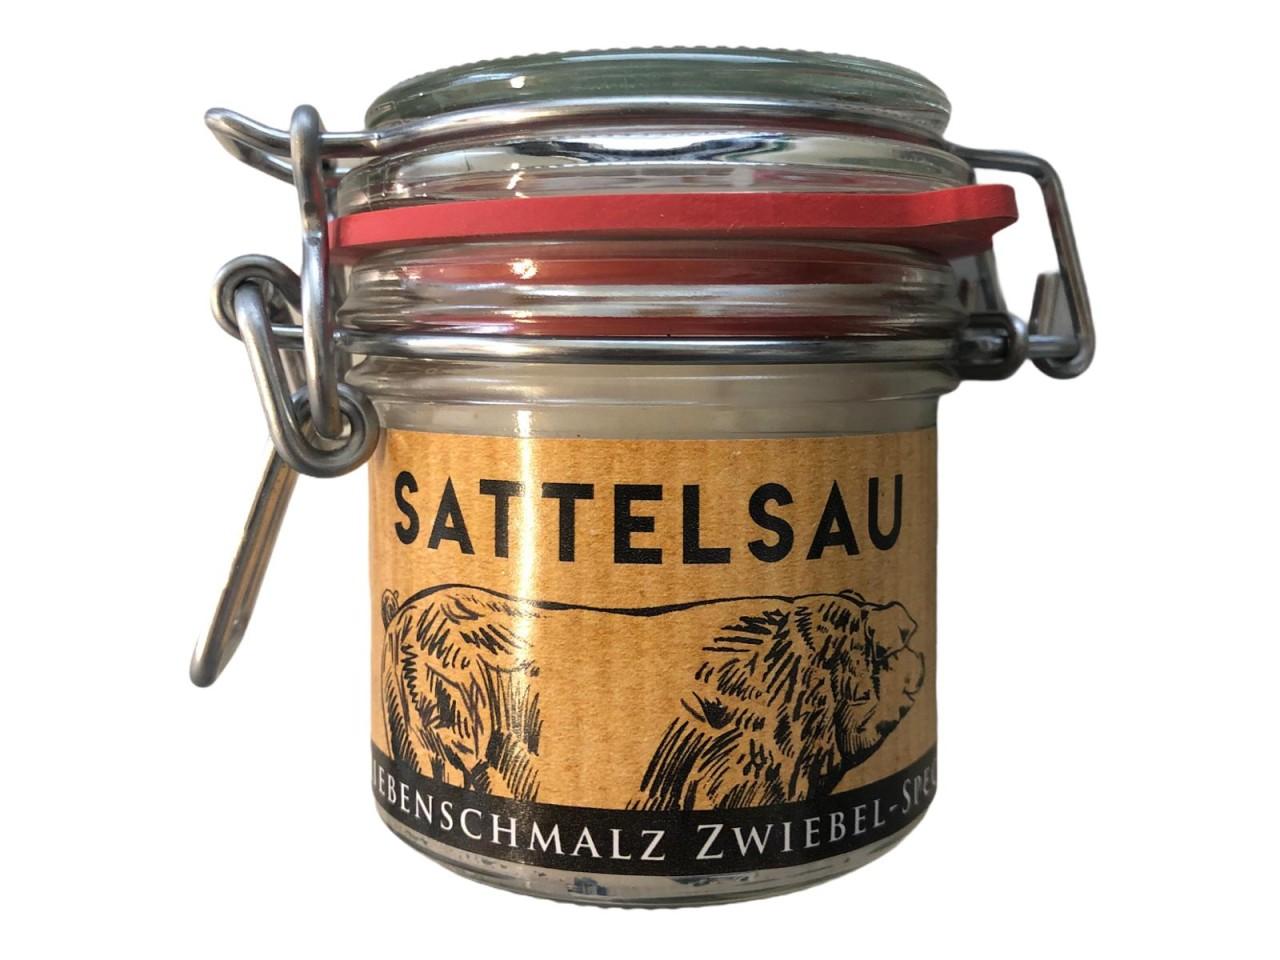 Schirmerhof Sattelsau Griebenschmalz Zwiebel-Speck 100 g